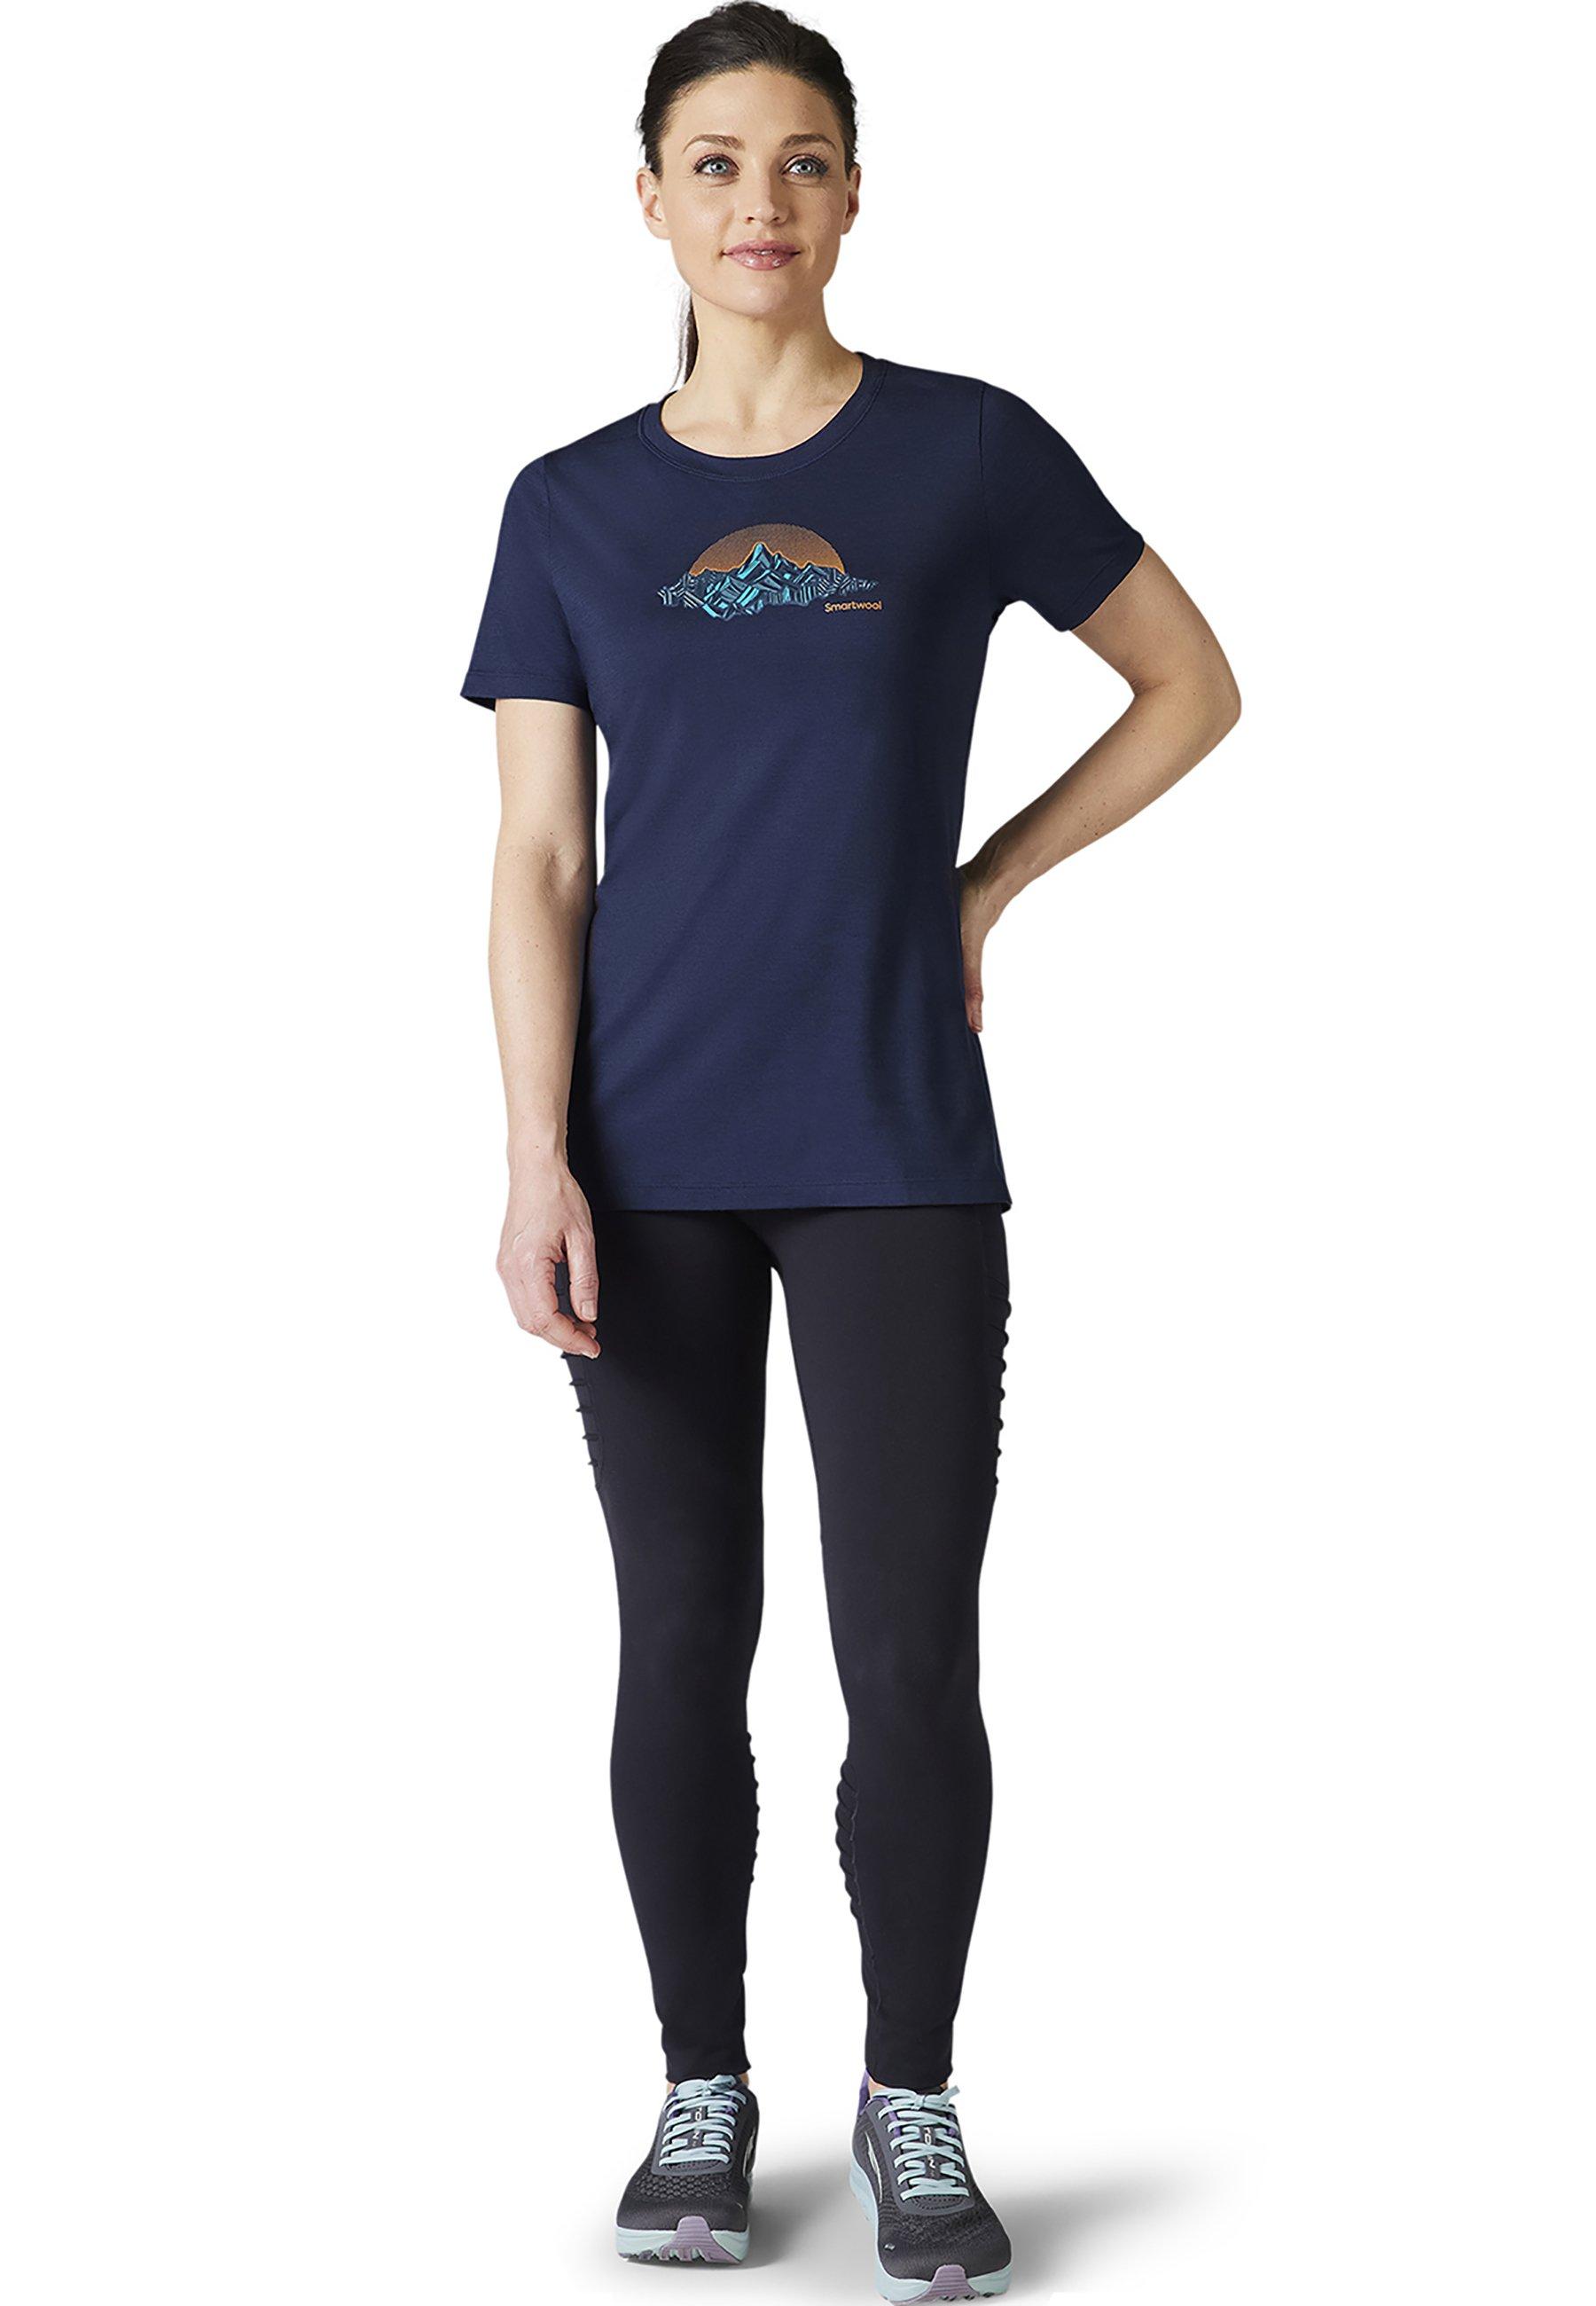 Donna RAINIER GRAPHIC TEE - T-shirt con stampa